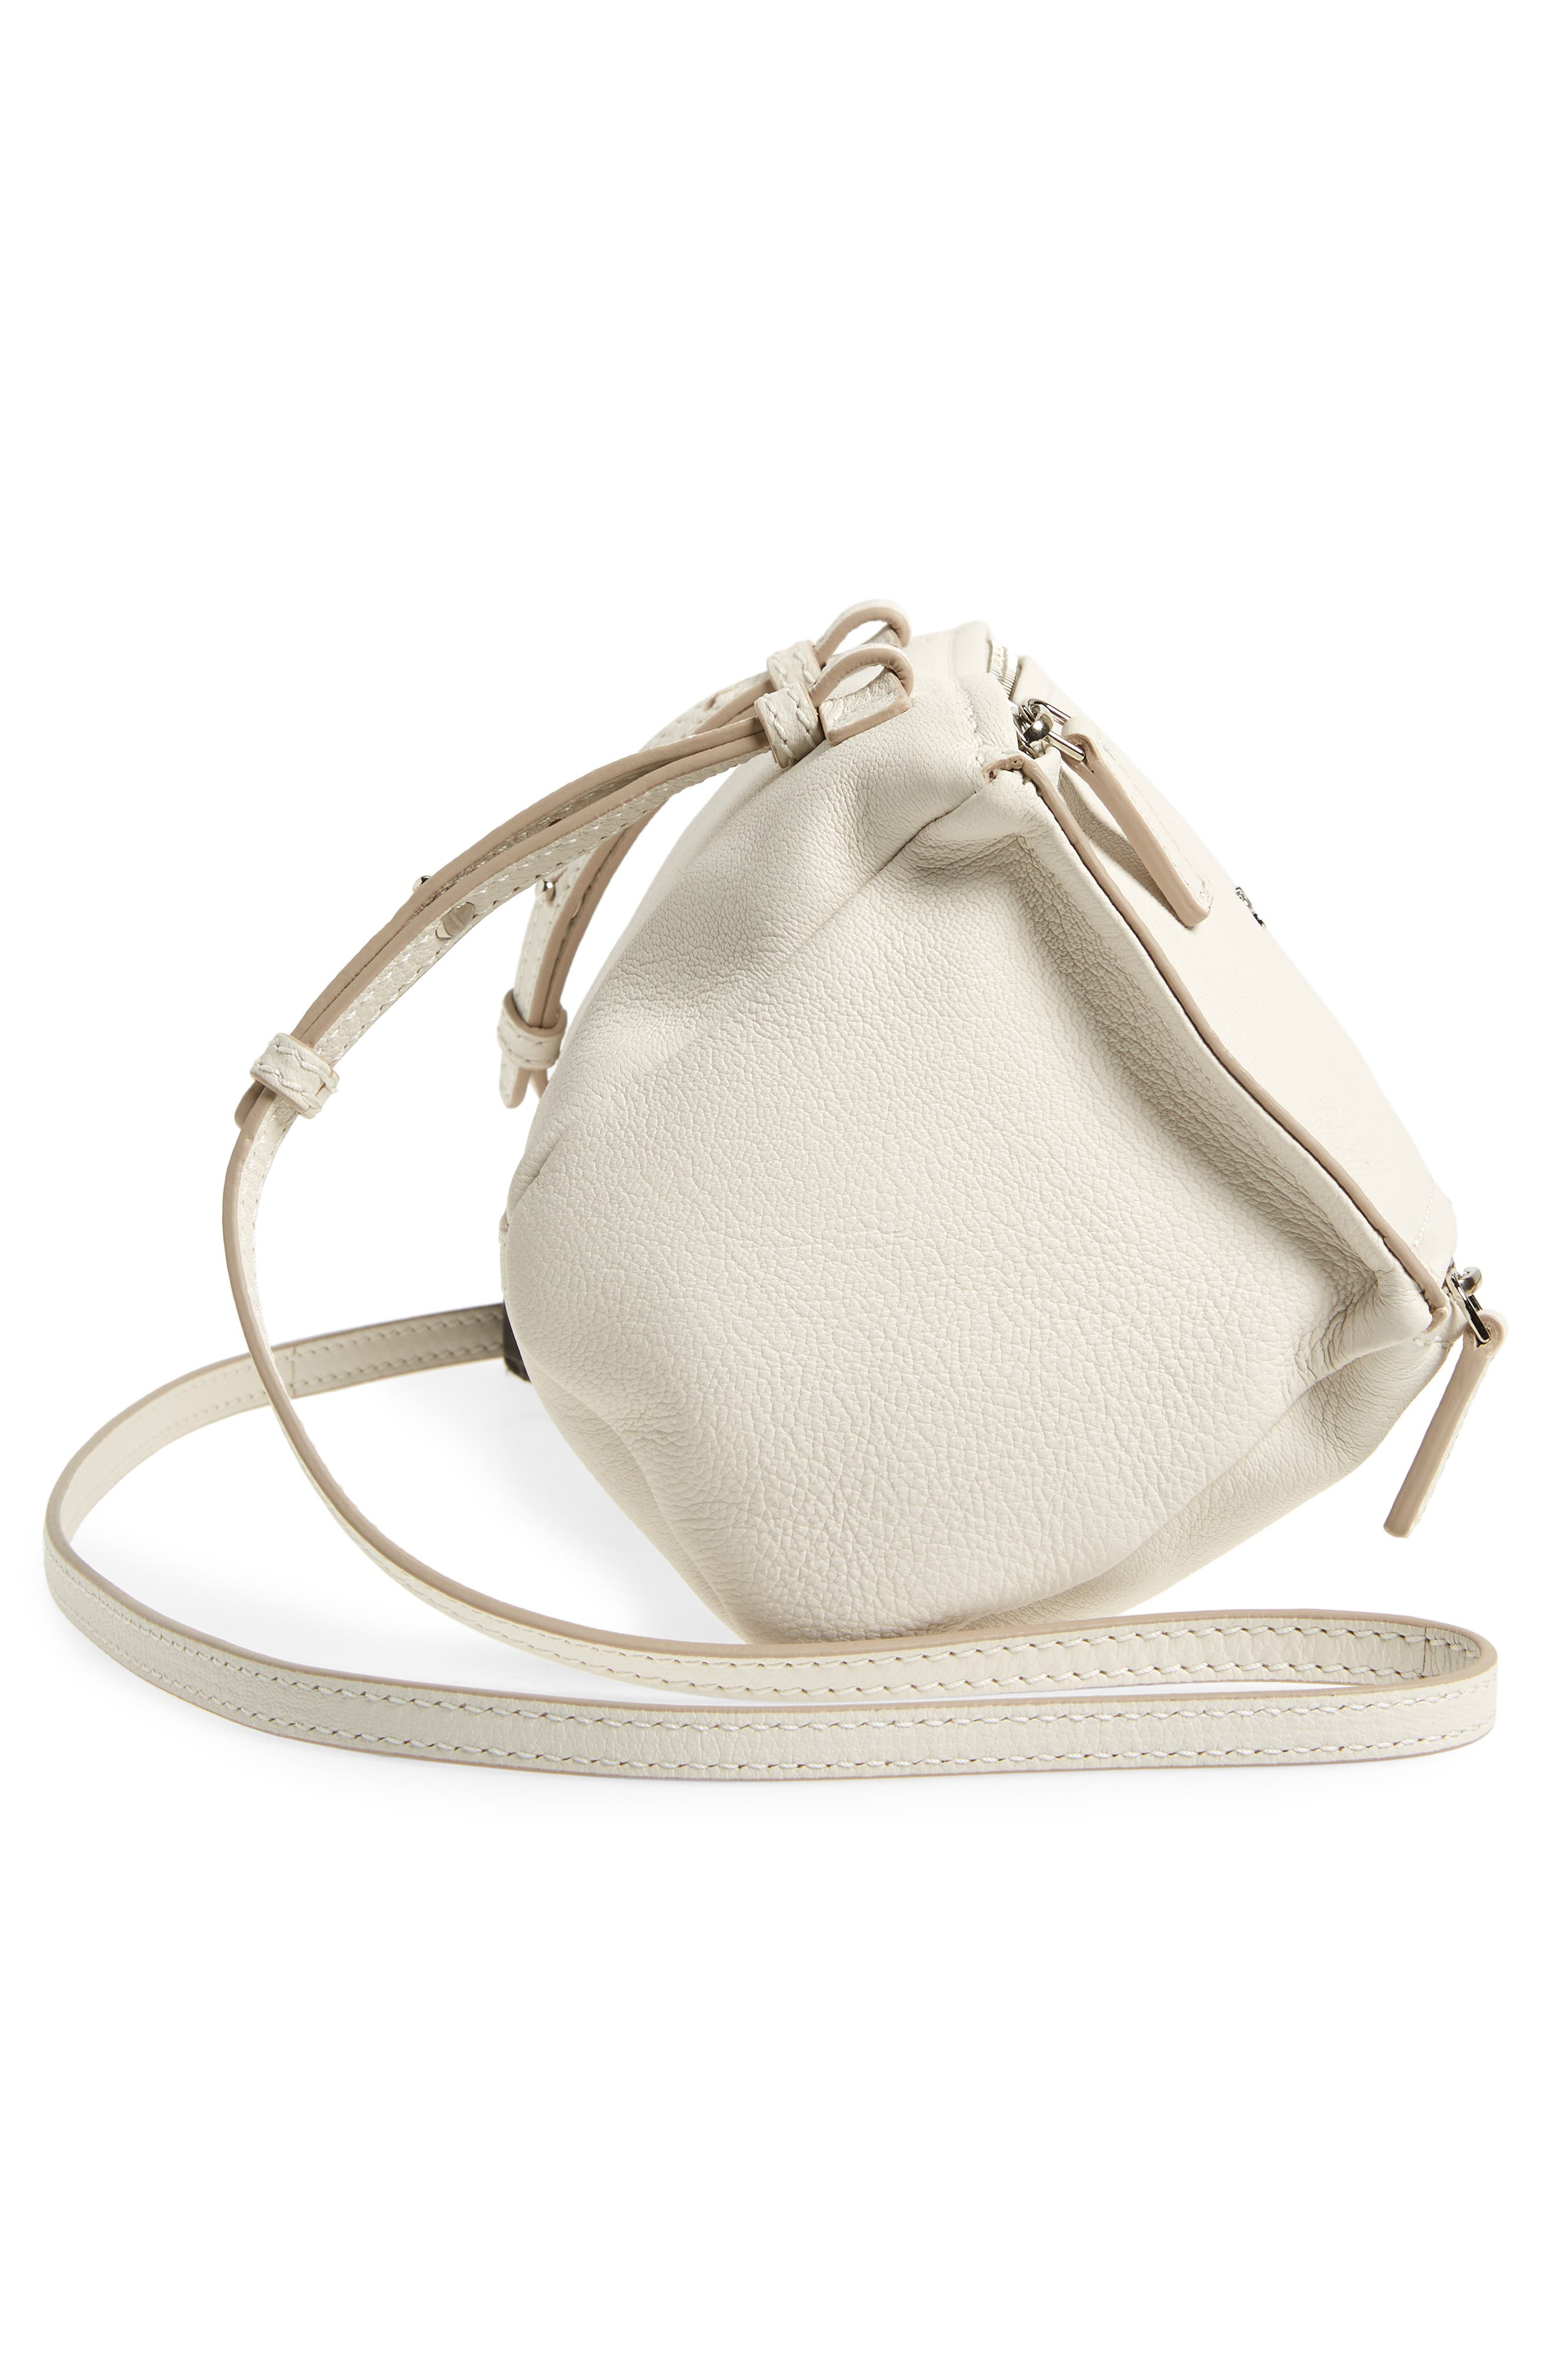 'Mini Pandora' Sugar Leather Shoulder Bag,                             Alternate thumbnail 5, color,                             WHITE